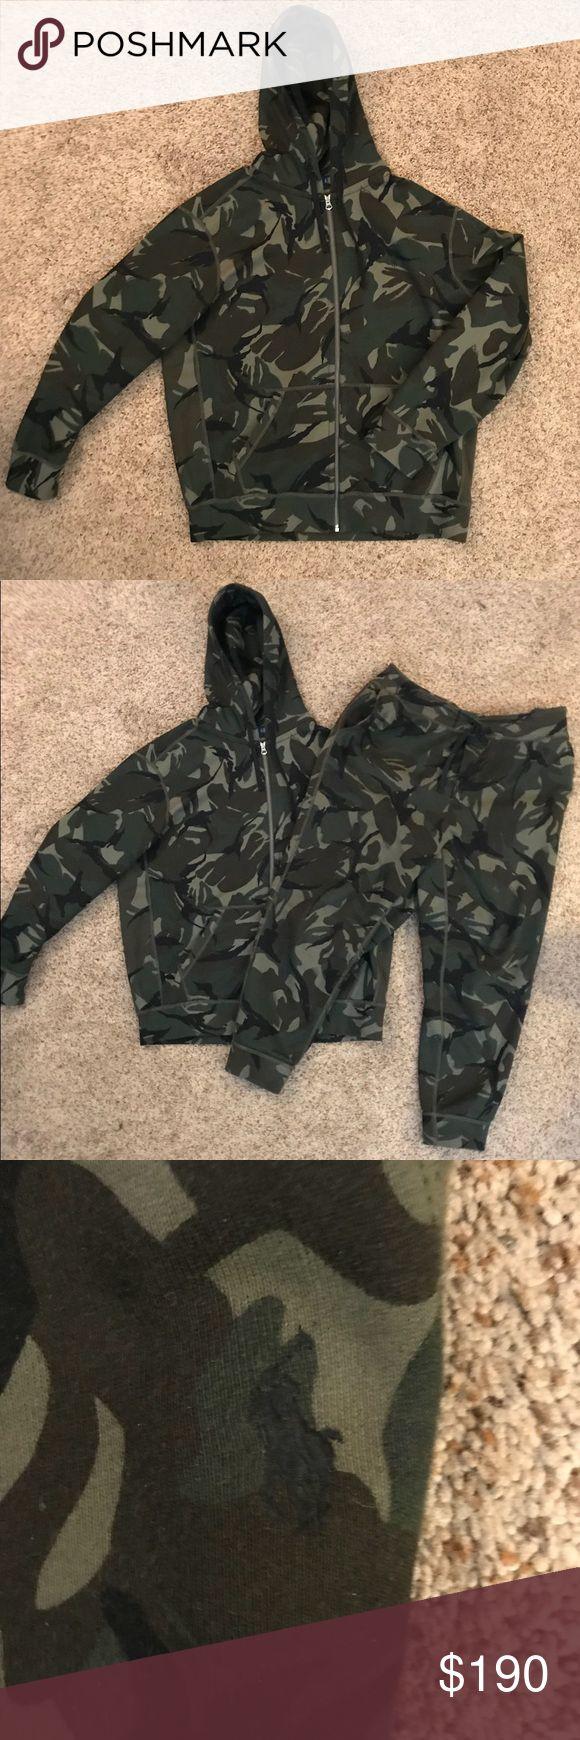 Polo by Ralph Lauren sweatsuit XL camouflage hoodie and jogger pants Polo by Ralph Lauren Shirts Sweatshirts & Hoodies